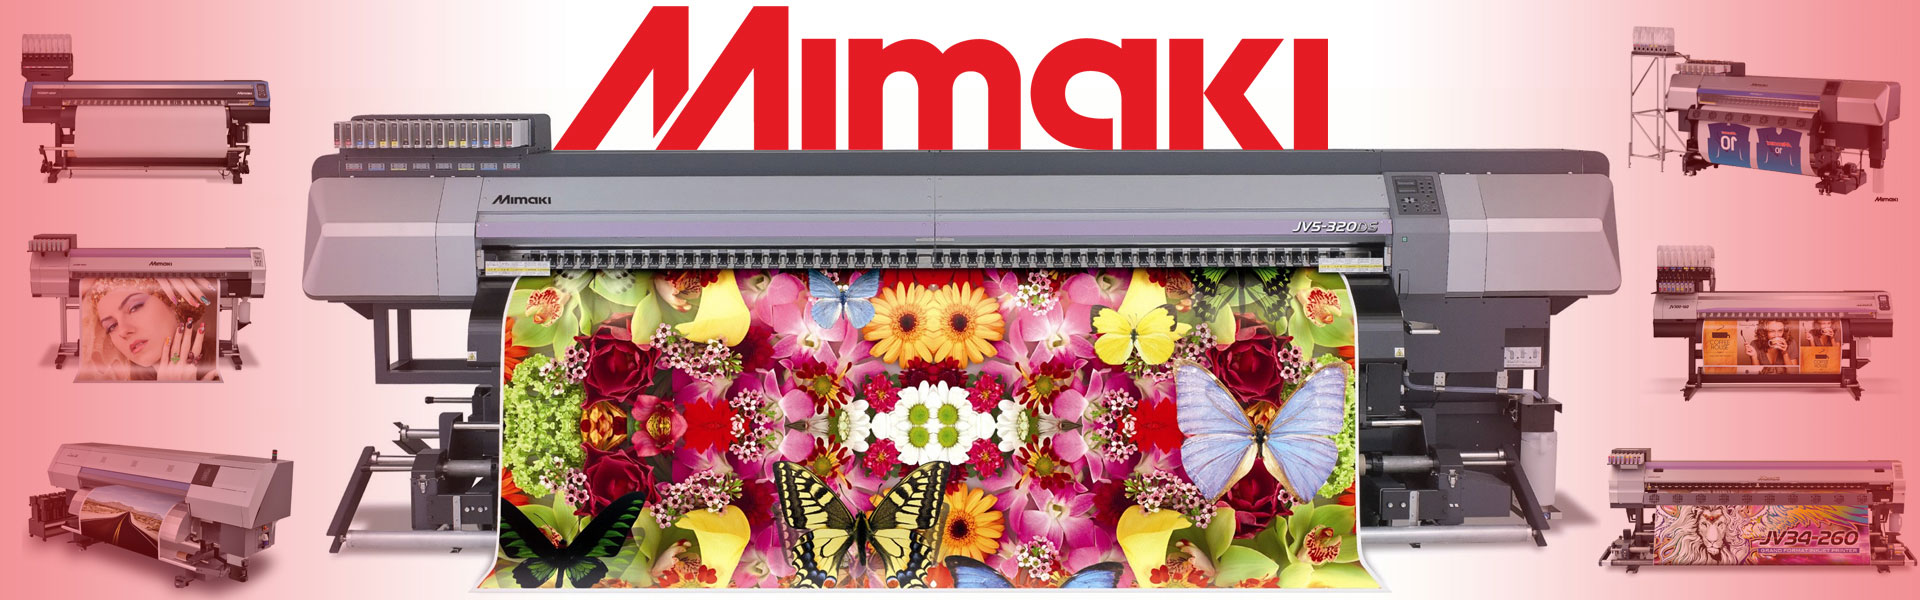 Mimaki-digital-textile-printers